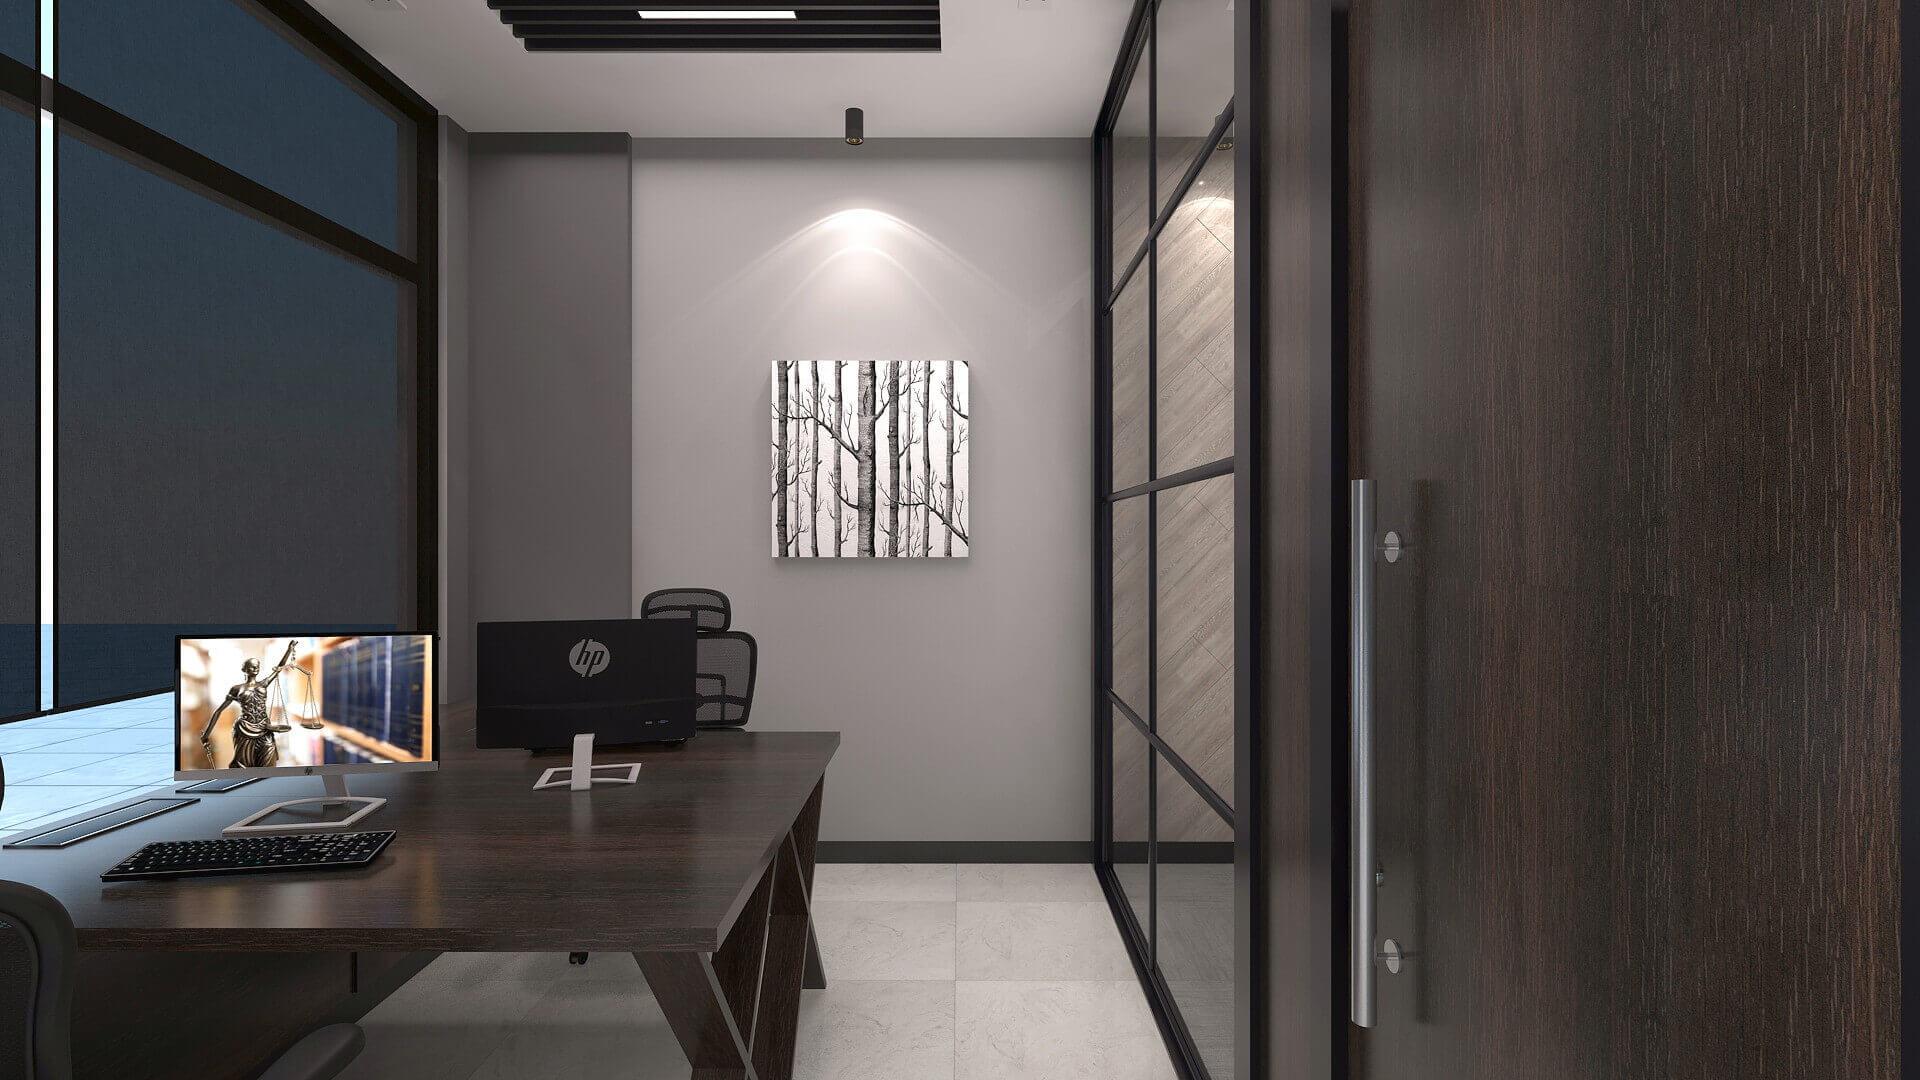 ofis mimari 2626 Şener Hukuk Ofisler